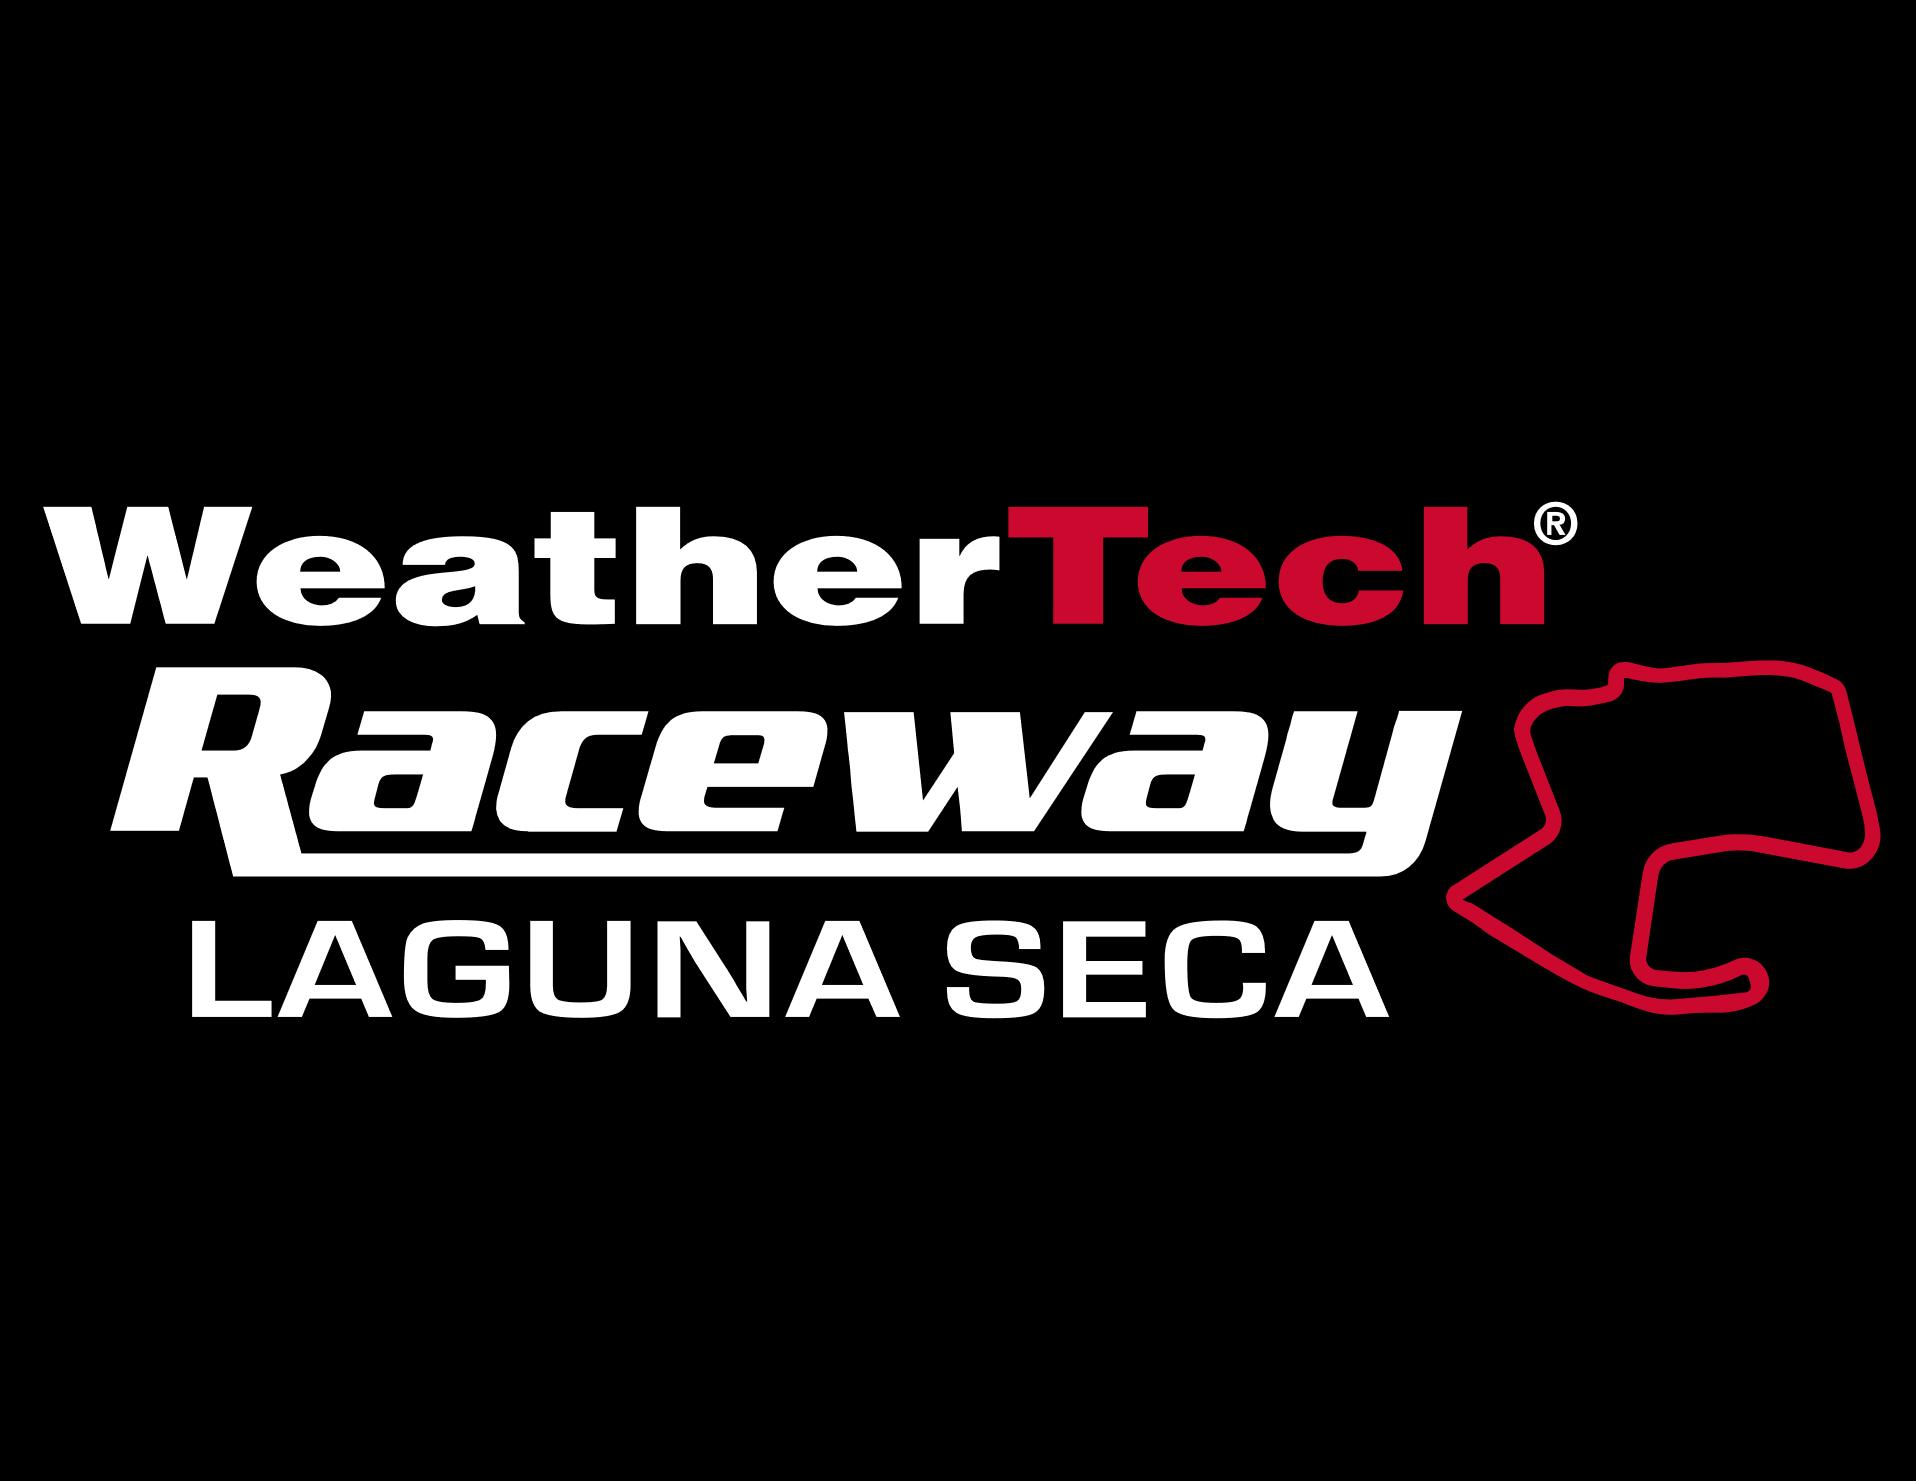 Laguna Seca Logo Čierny okraj